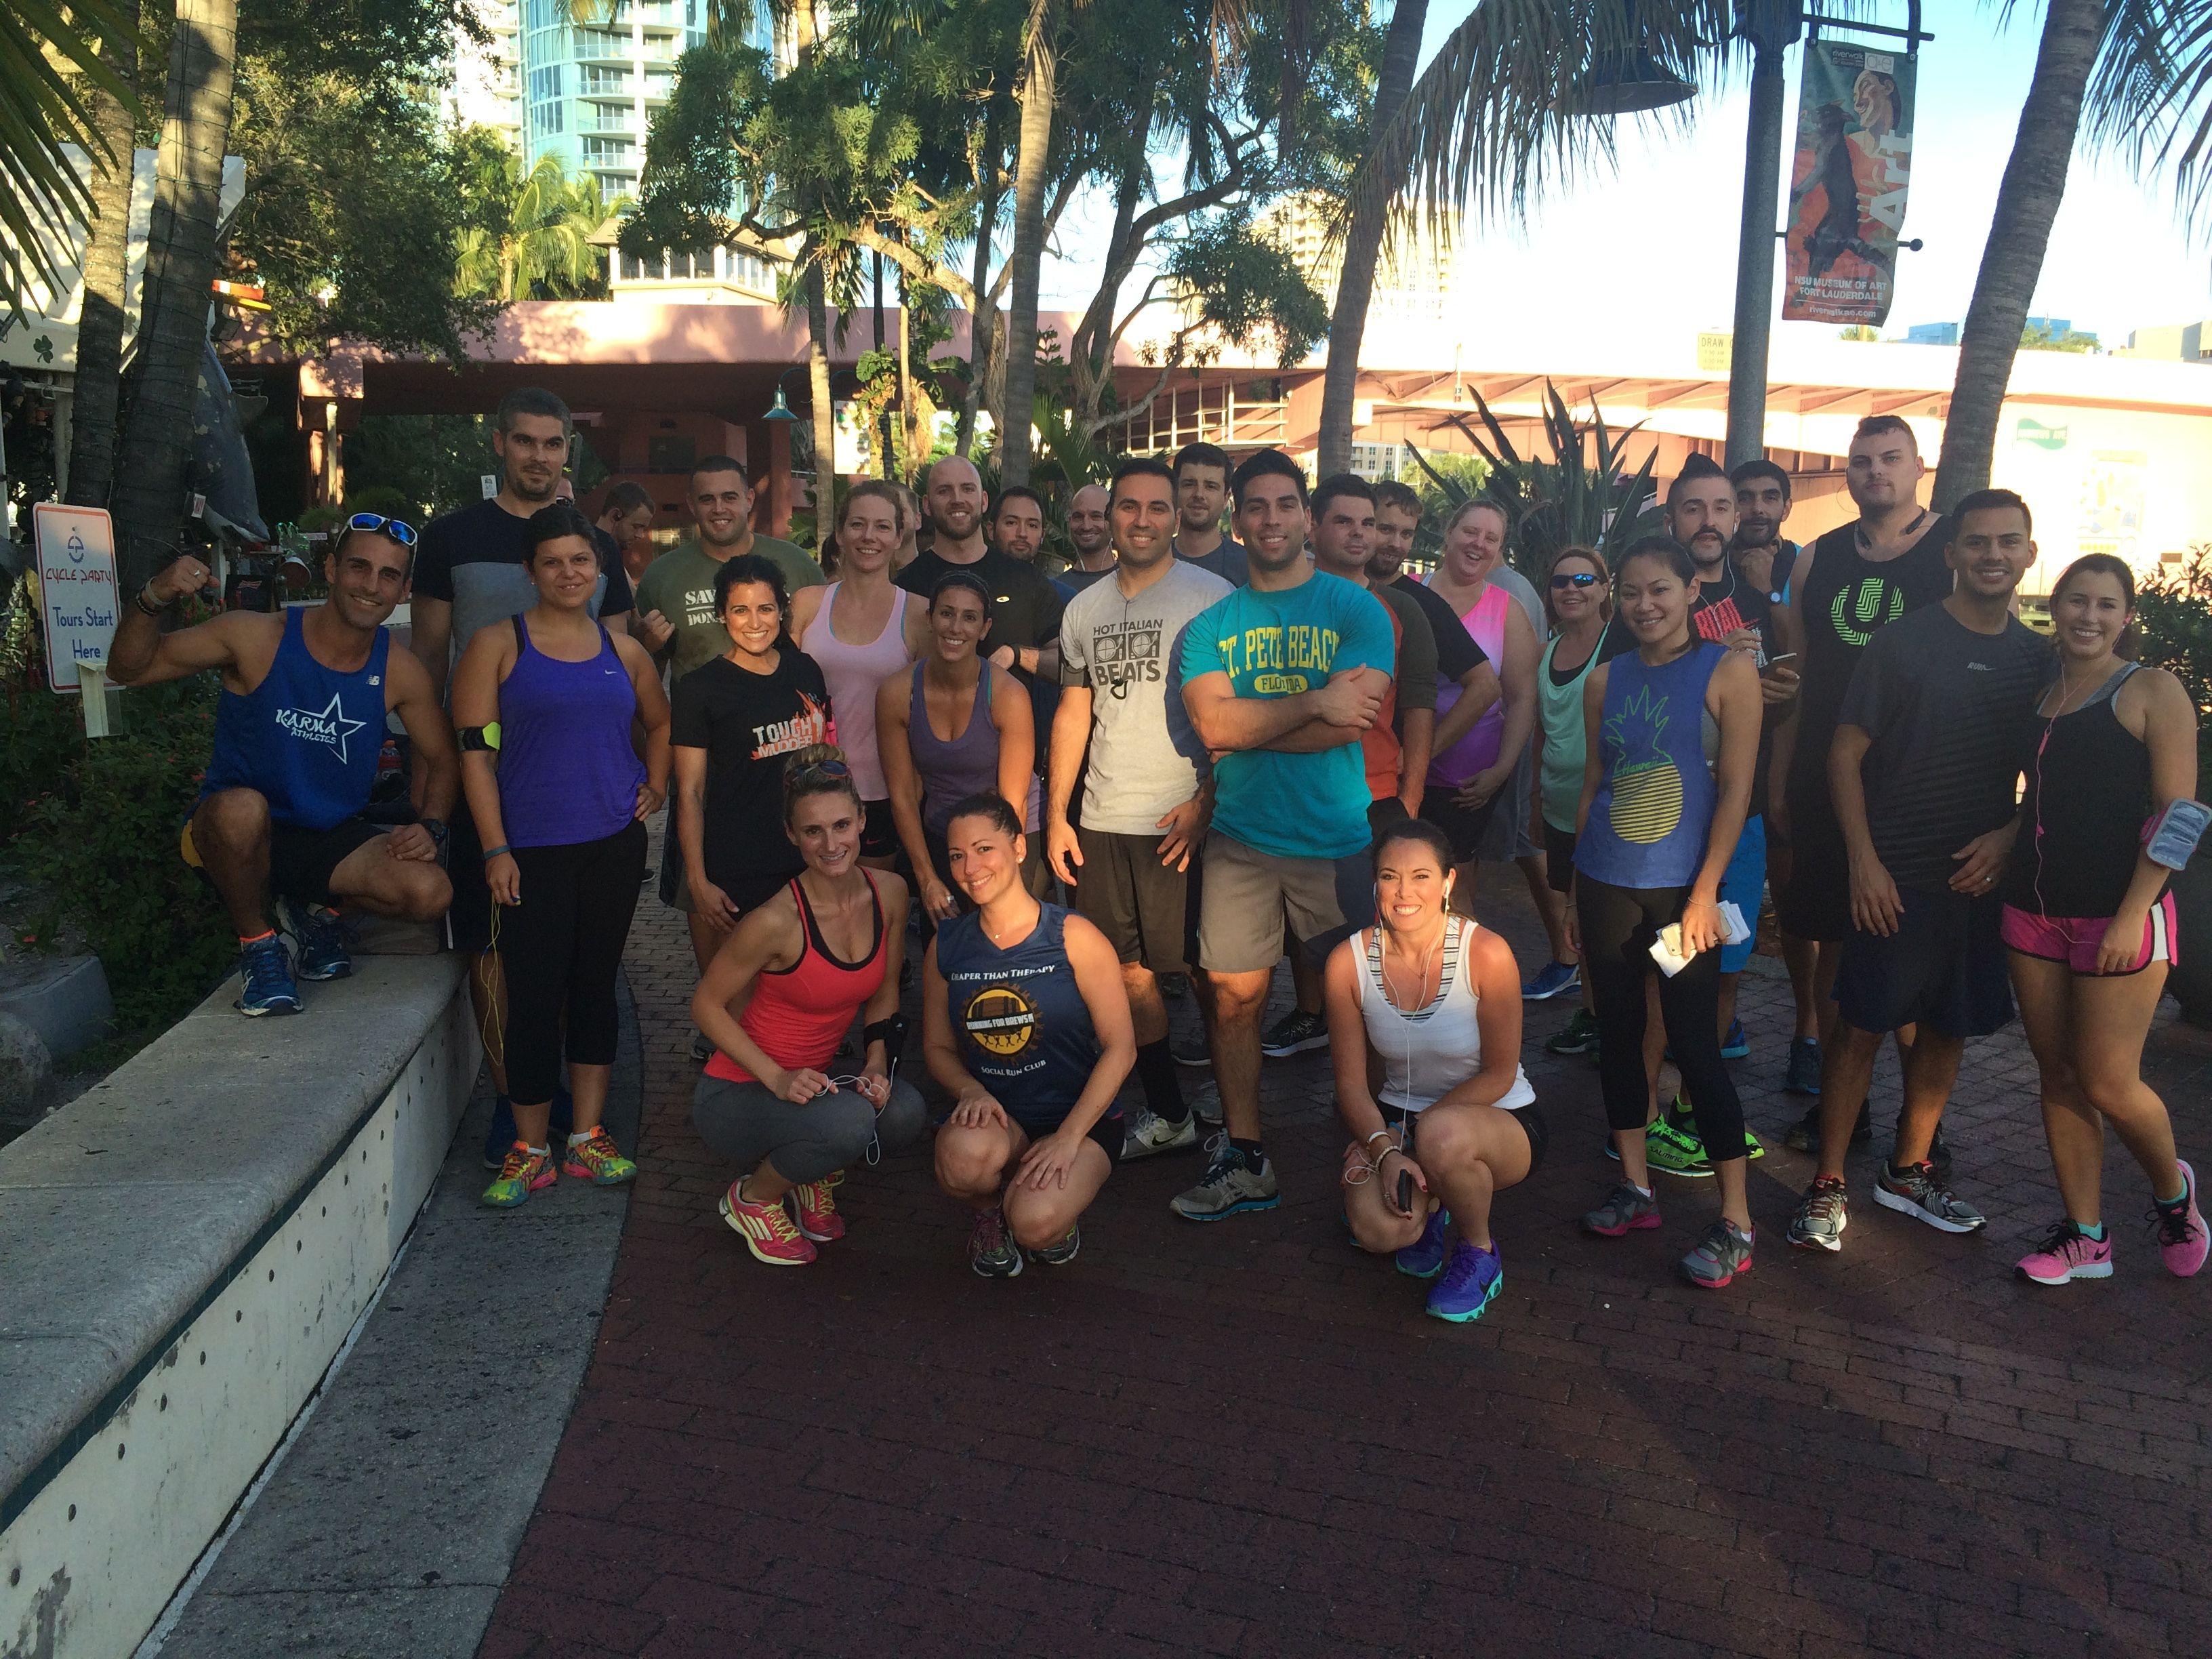 Running for Brews Fort Lauderdale - 5k Beer Running Club